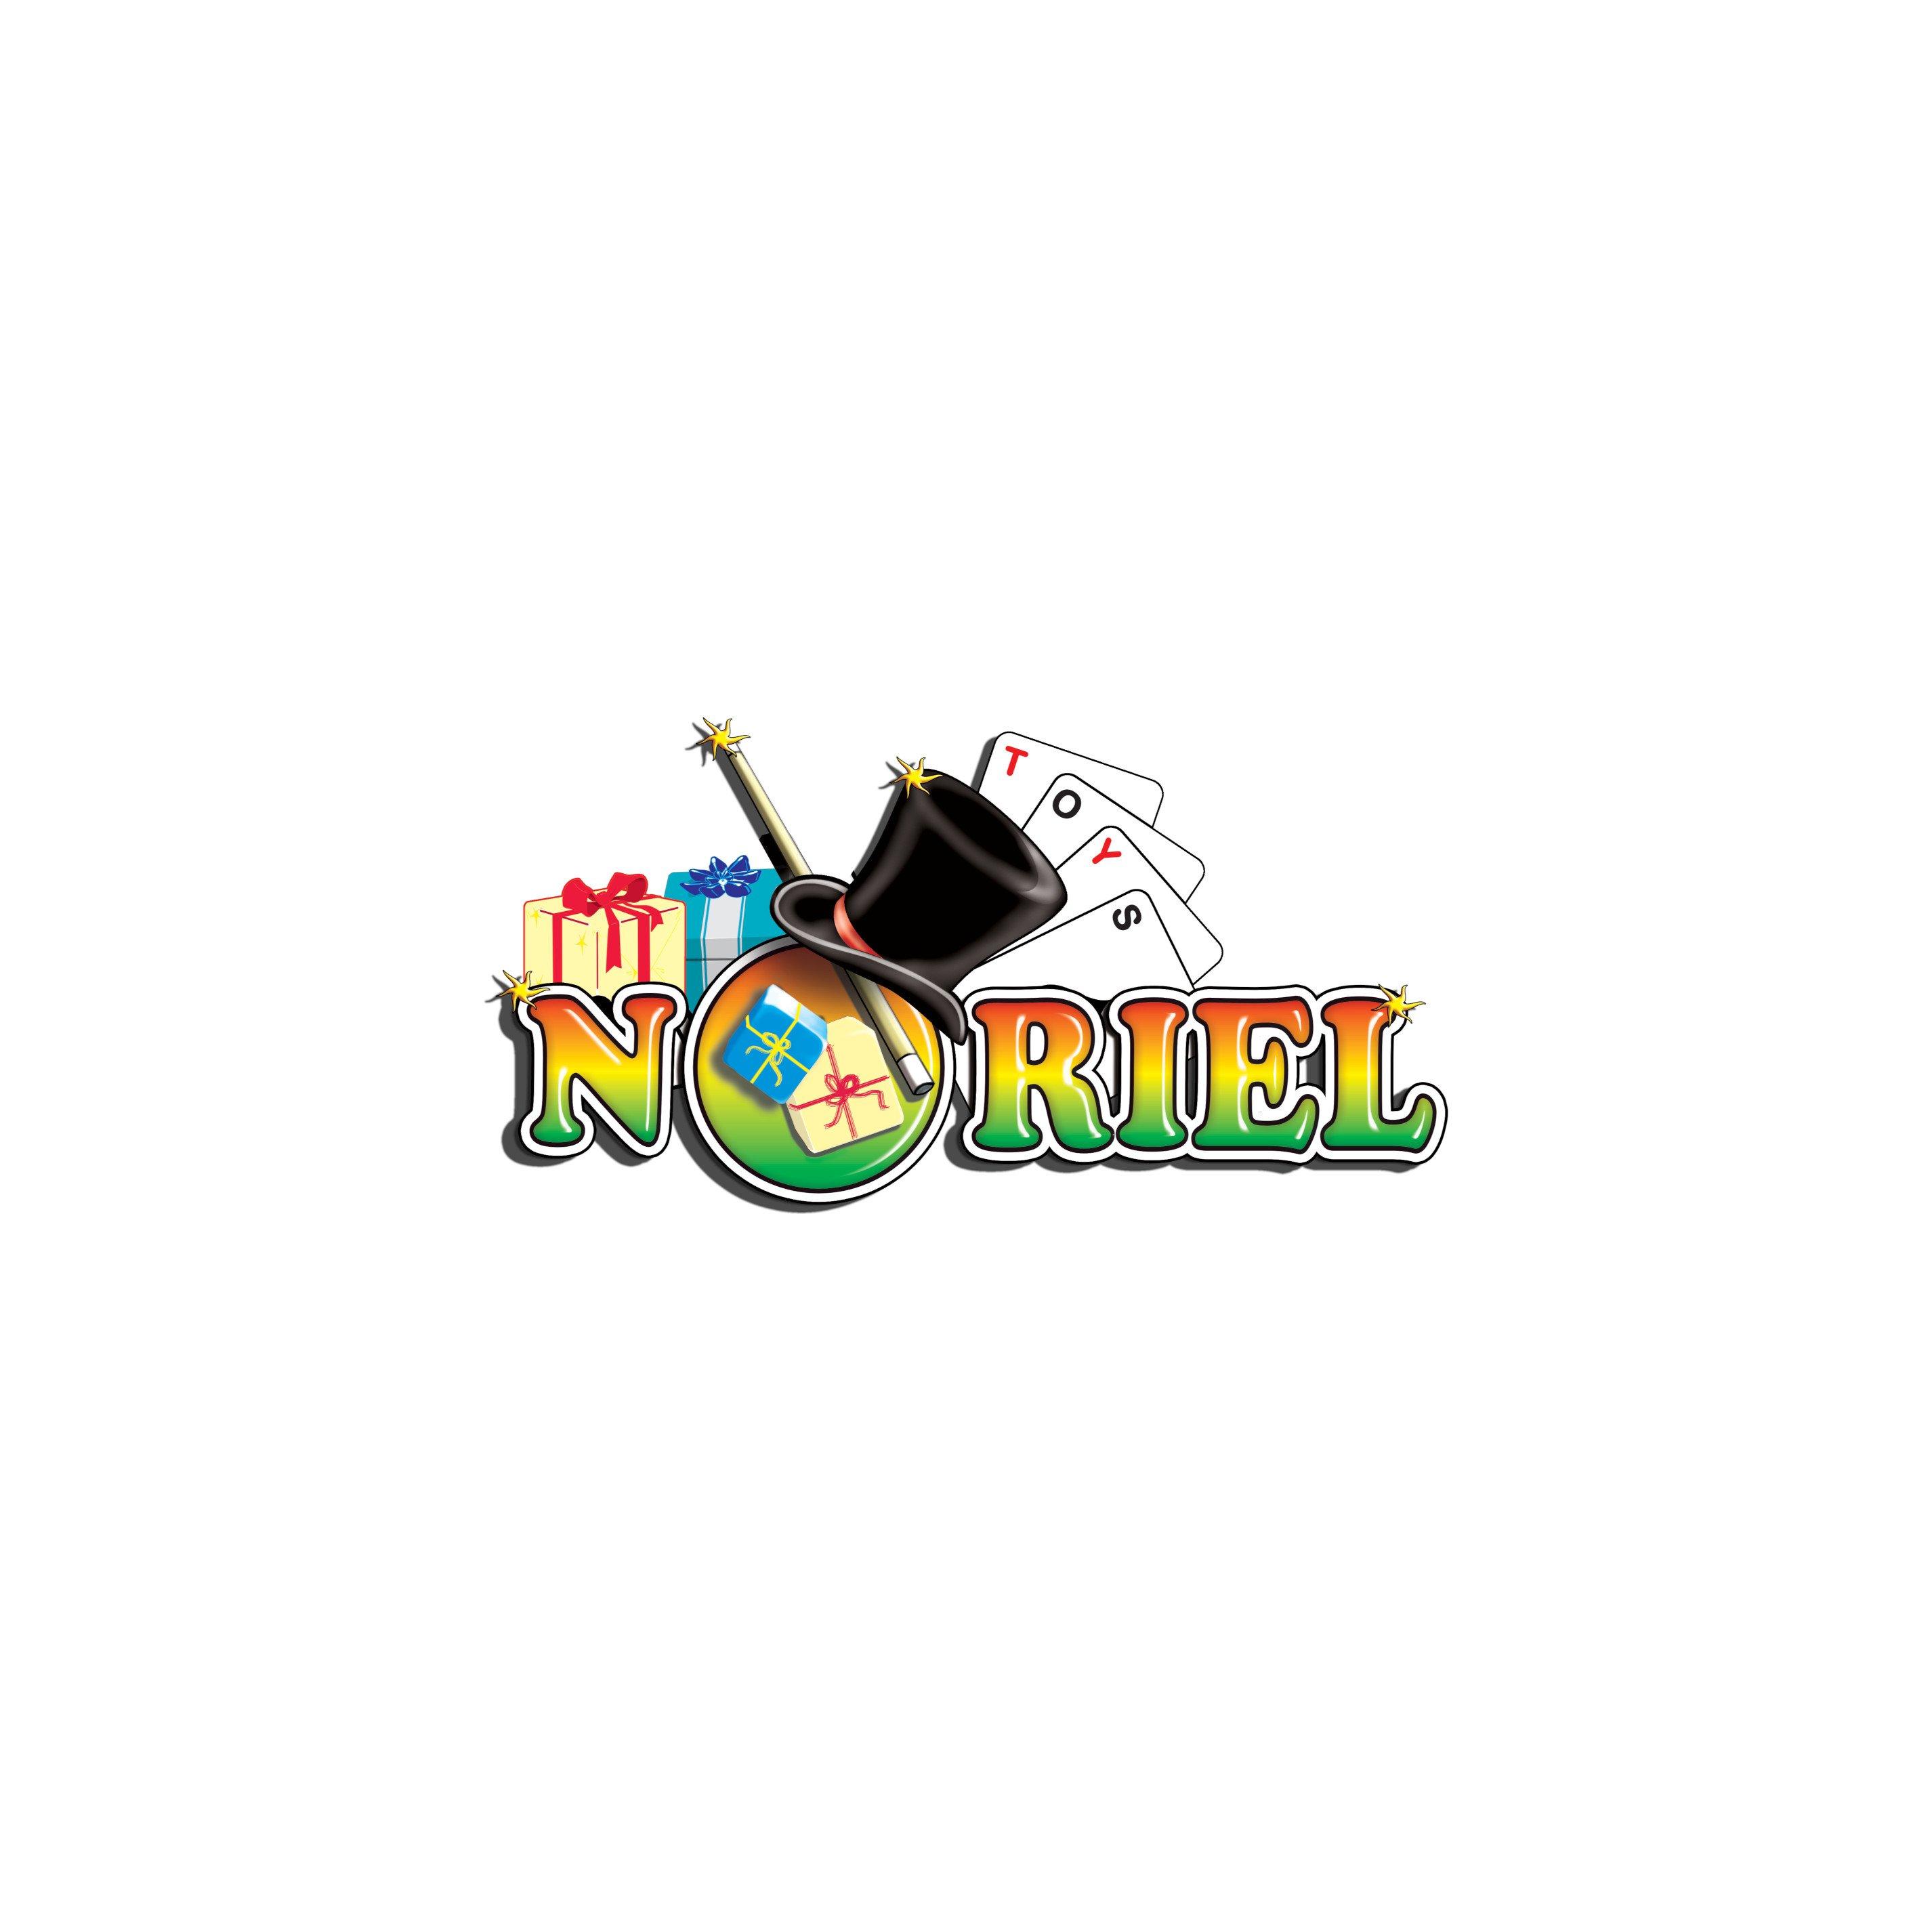 NC44077_001w Puzzle cu ursul Crizz Lee si aricii Hedda si Henny, Nici, 30 piese